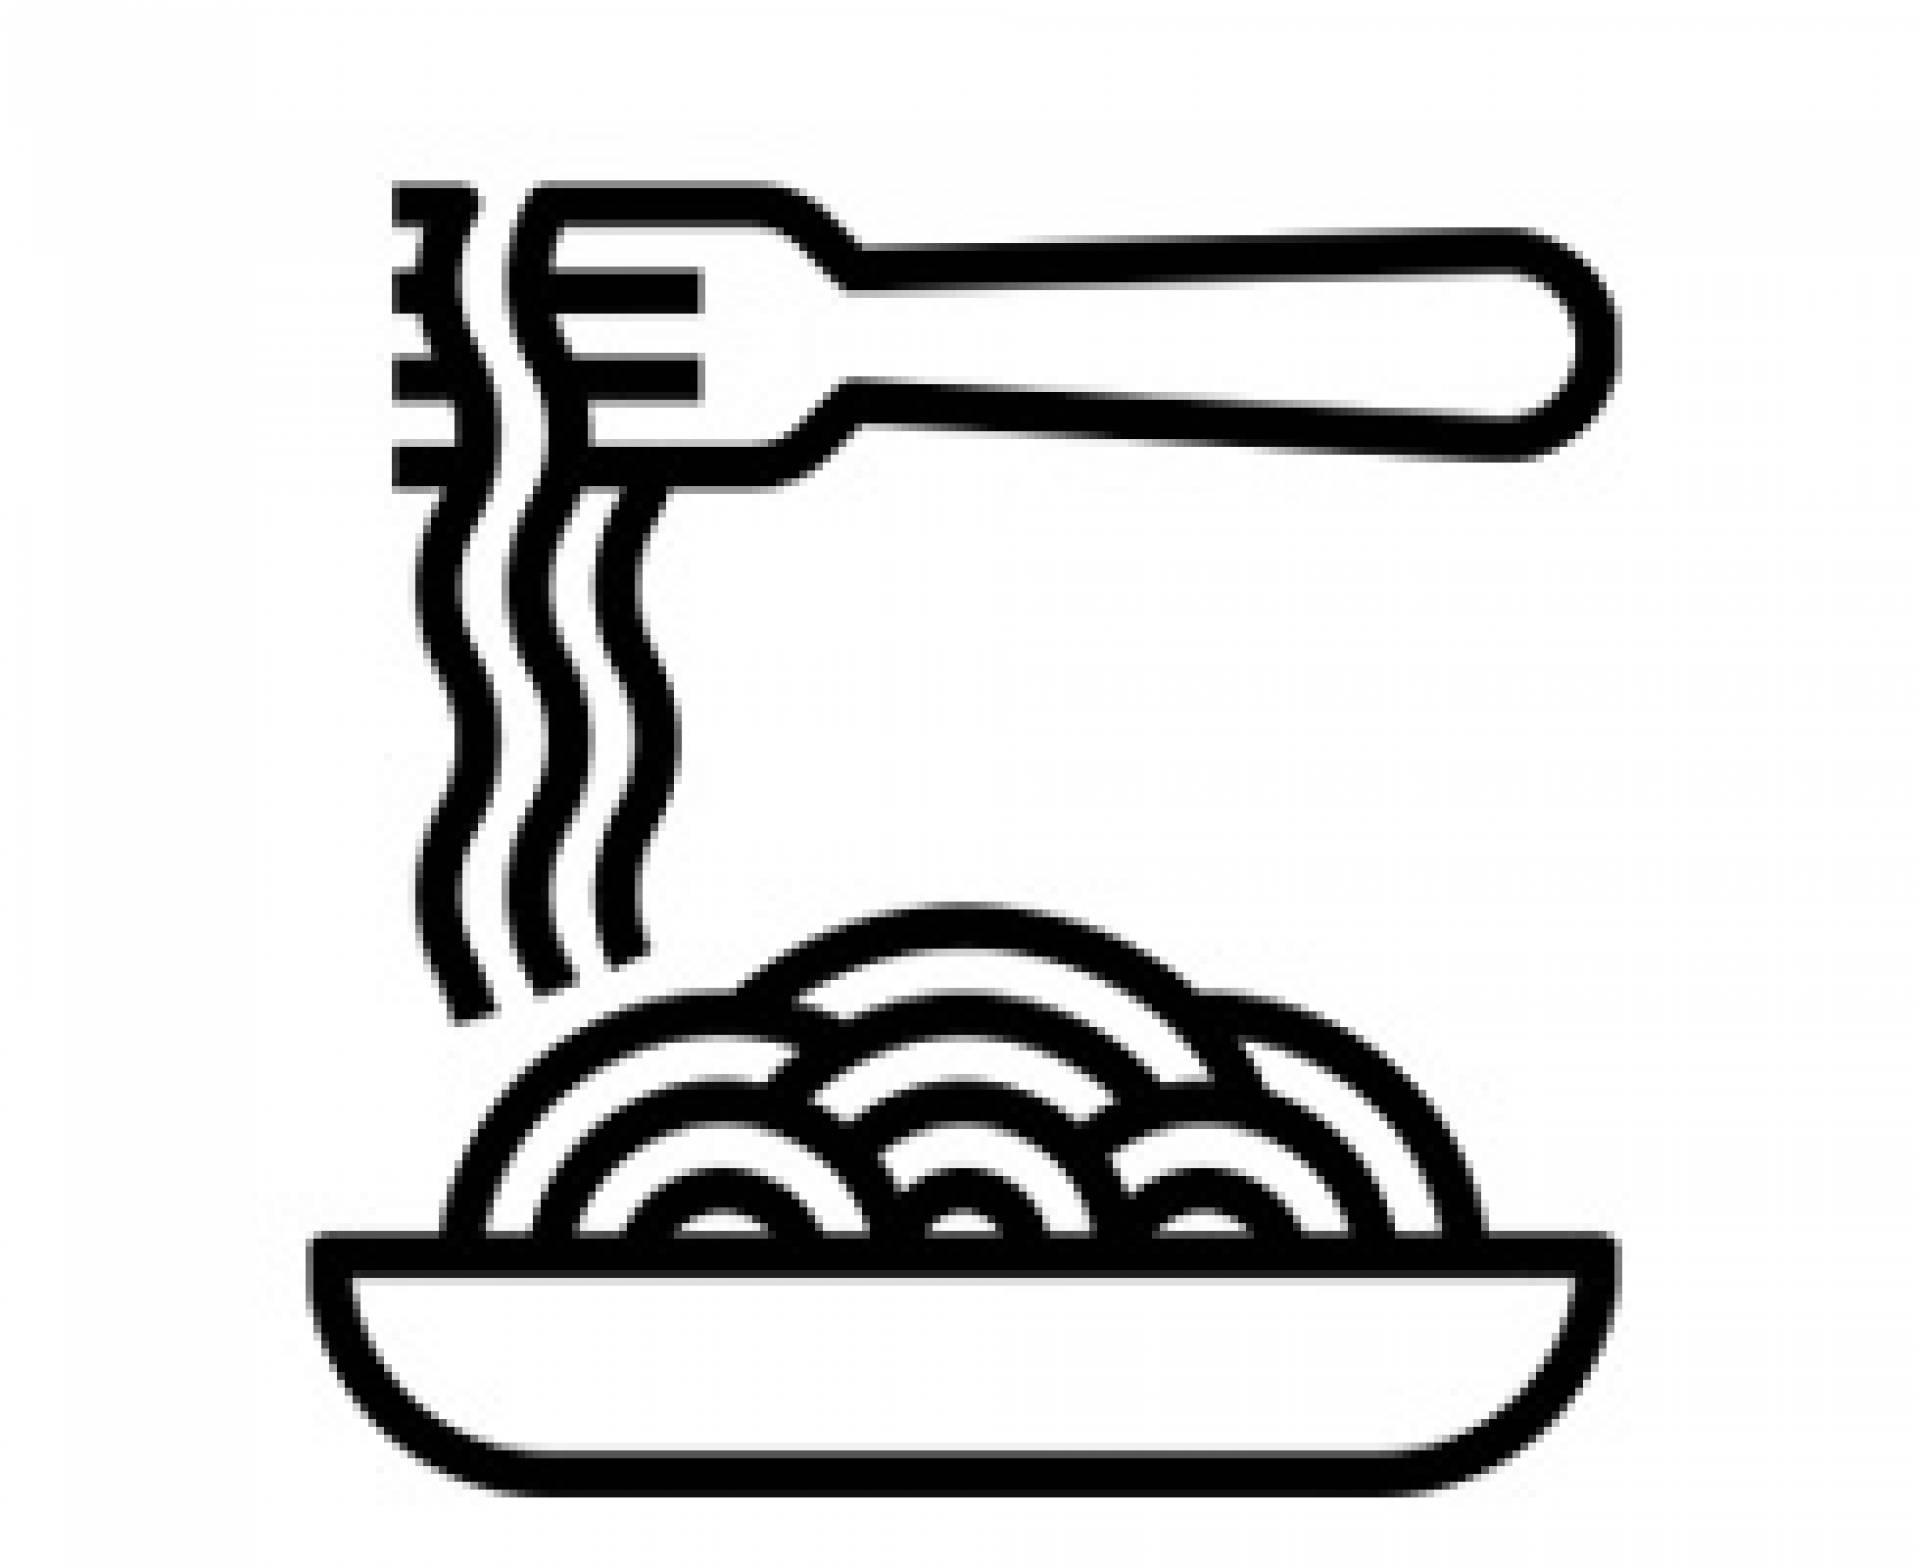 Restaurant Quality